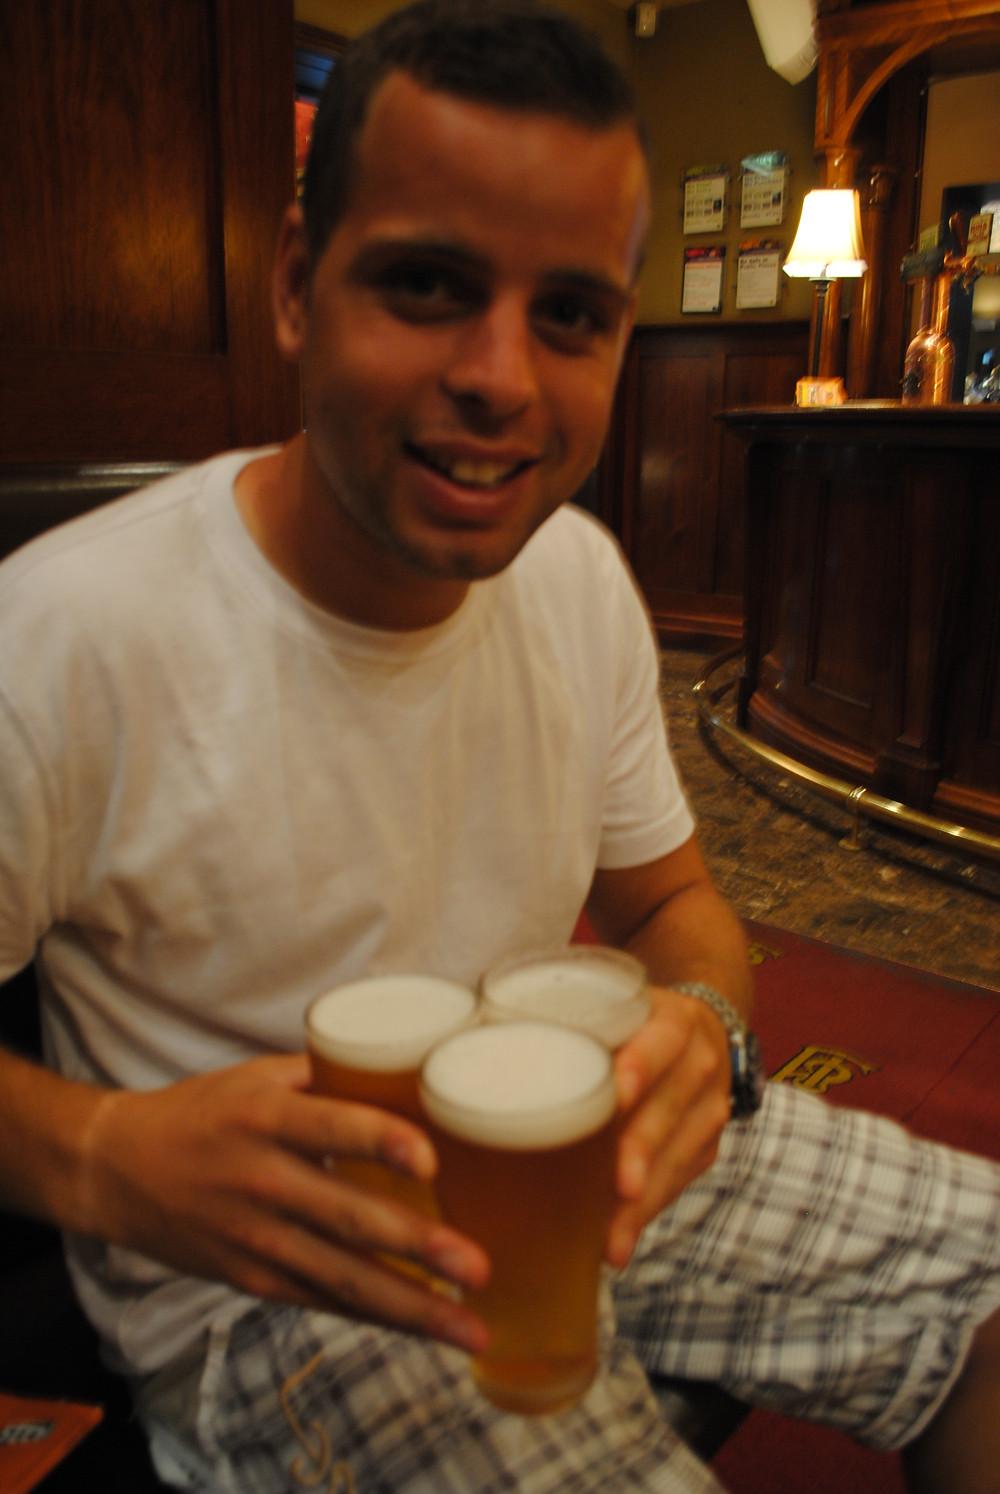 drinking VB beer